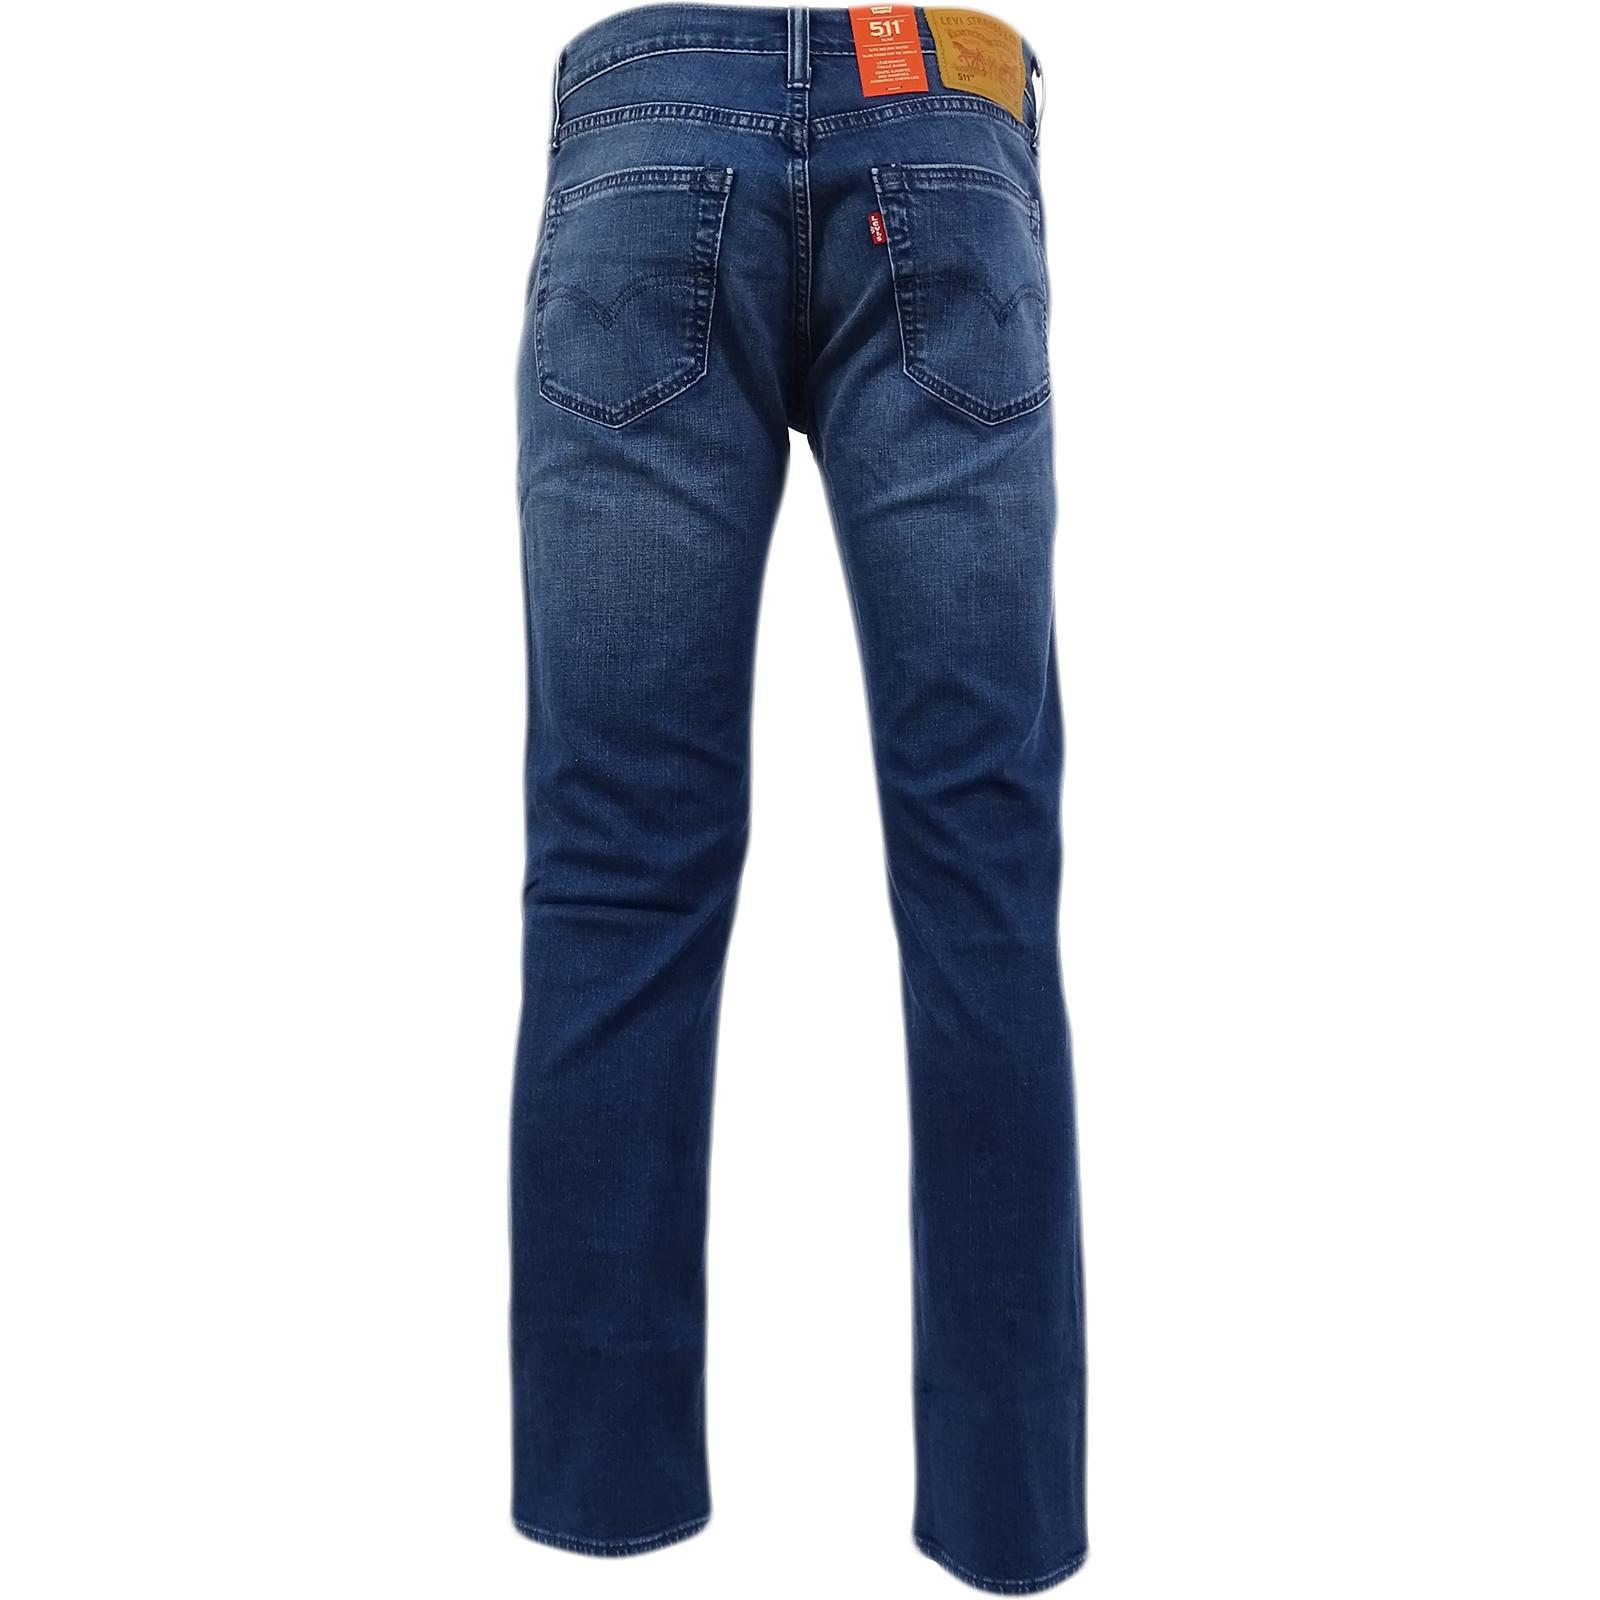 Levi-Strauss-511-pierna-delgada-Jean-ligero-estiramiento-reina-azul-28-48